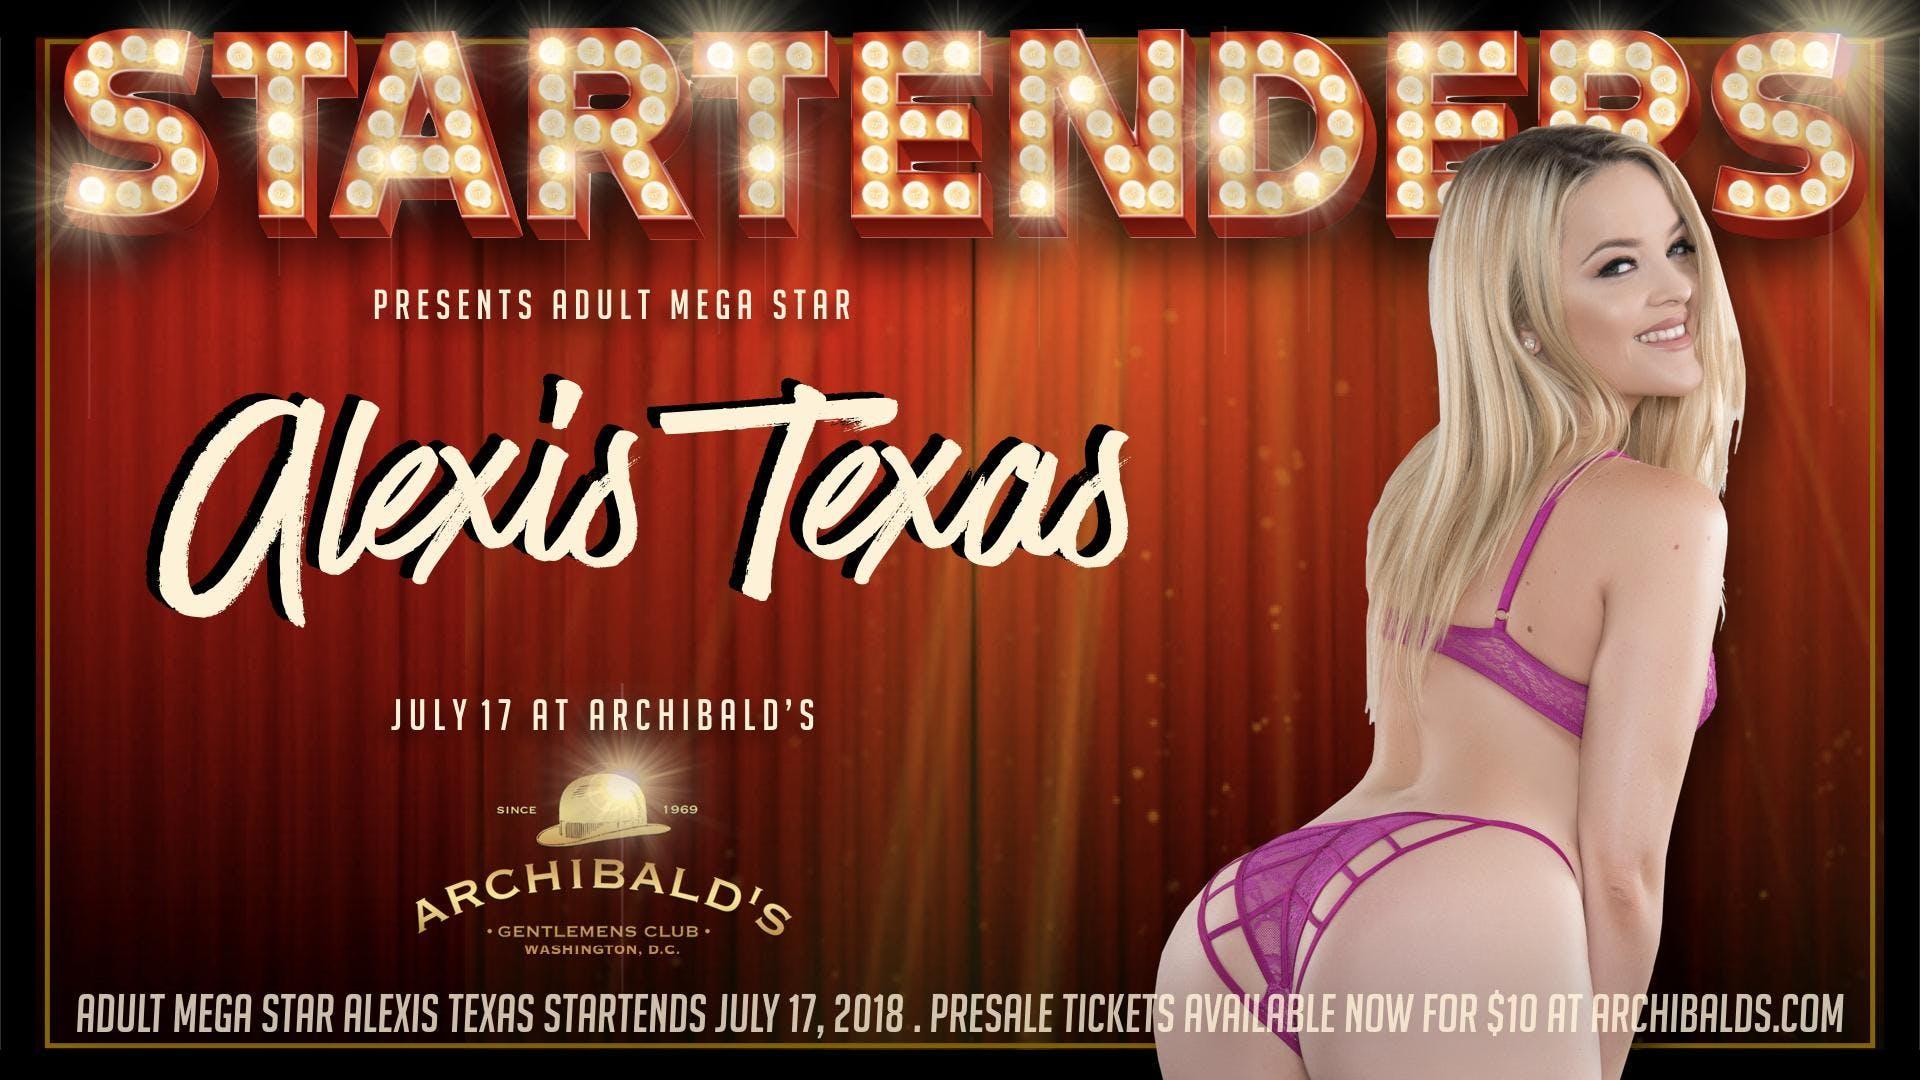 Startenders Alexis Texas At Archibalds Gentlemens Club Washington